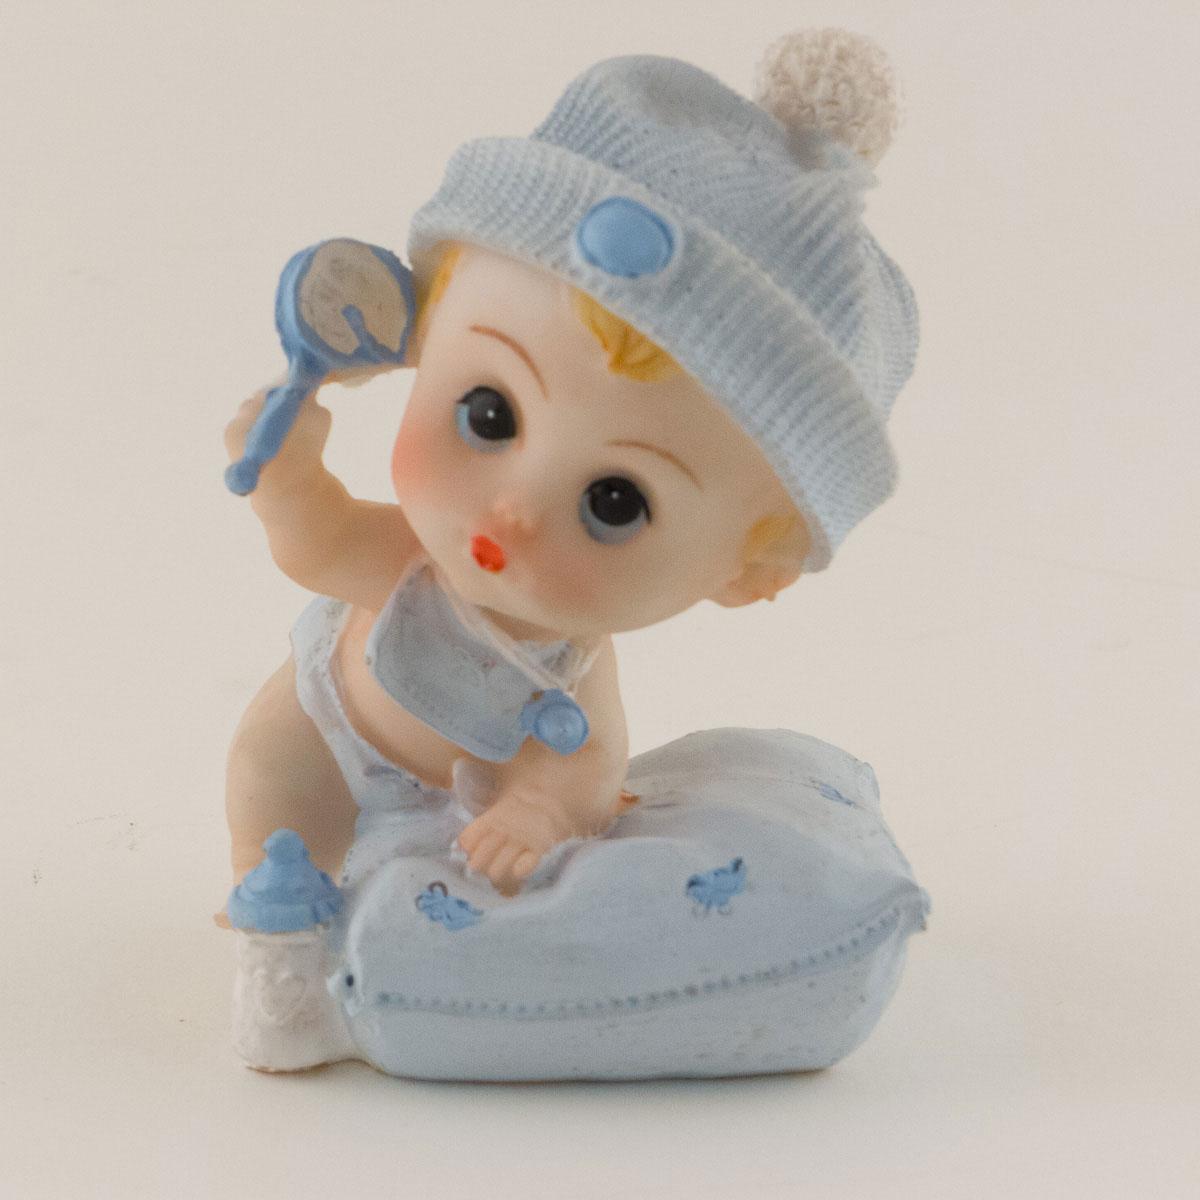 Baby Girl/Boy With Pillow Keepsake Shower Figurine Decoration Statue Gift 12 Pcs